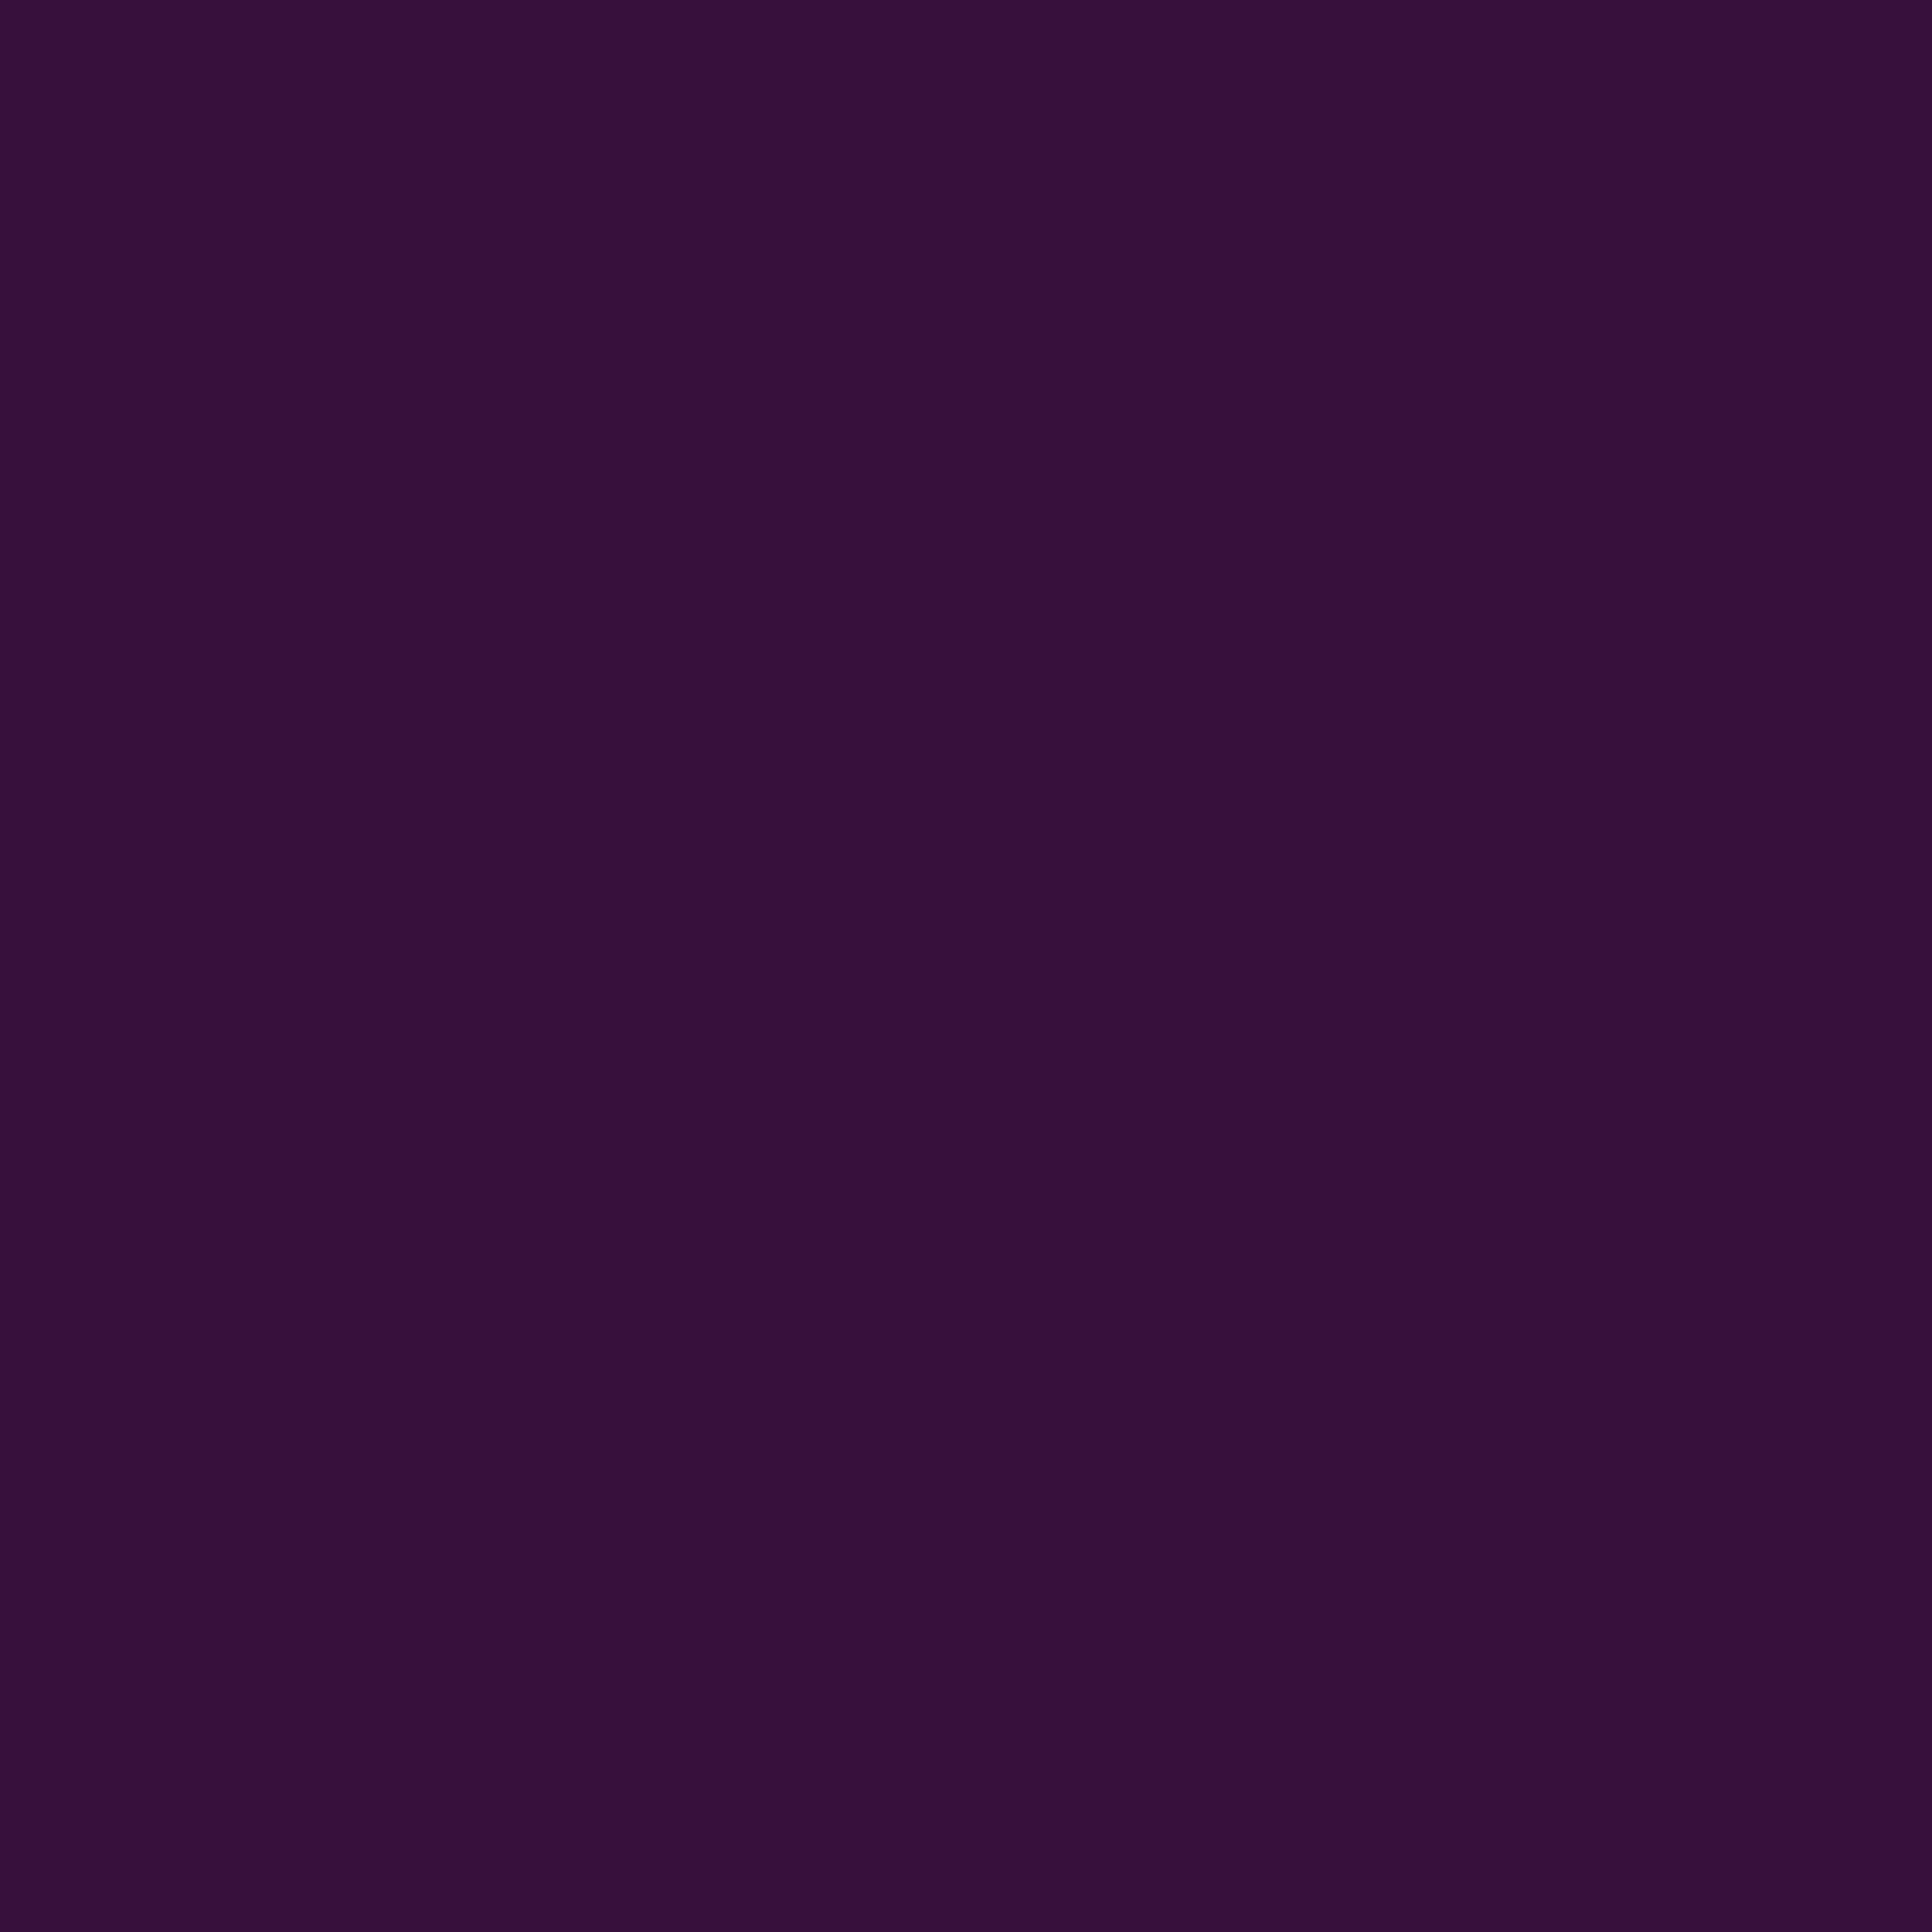 Pantone 525   HEX: #37123A   RGB: 55, 18, 58   CMYK: 75, 95, 43, 53